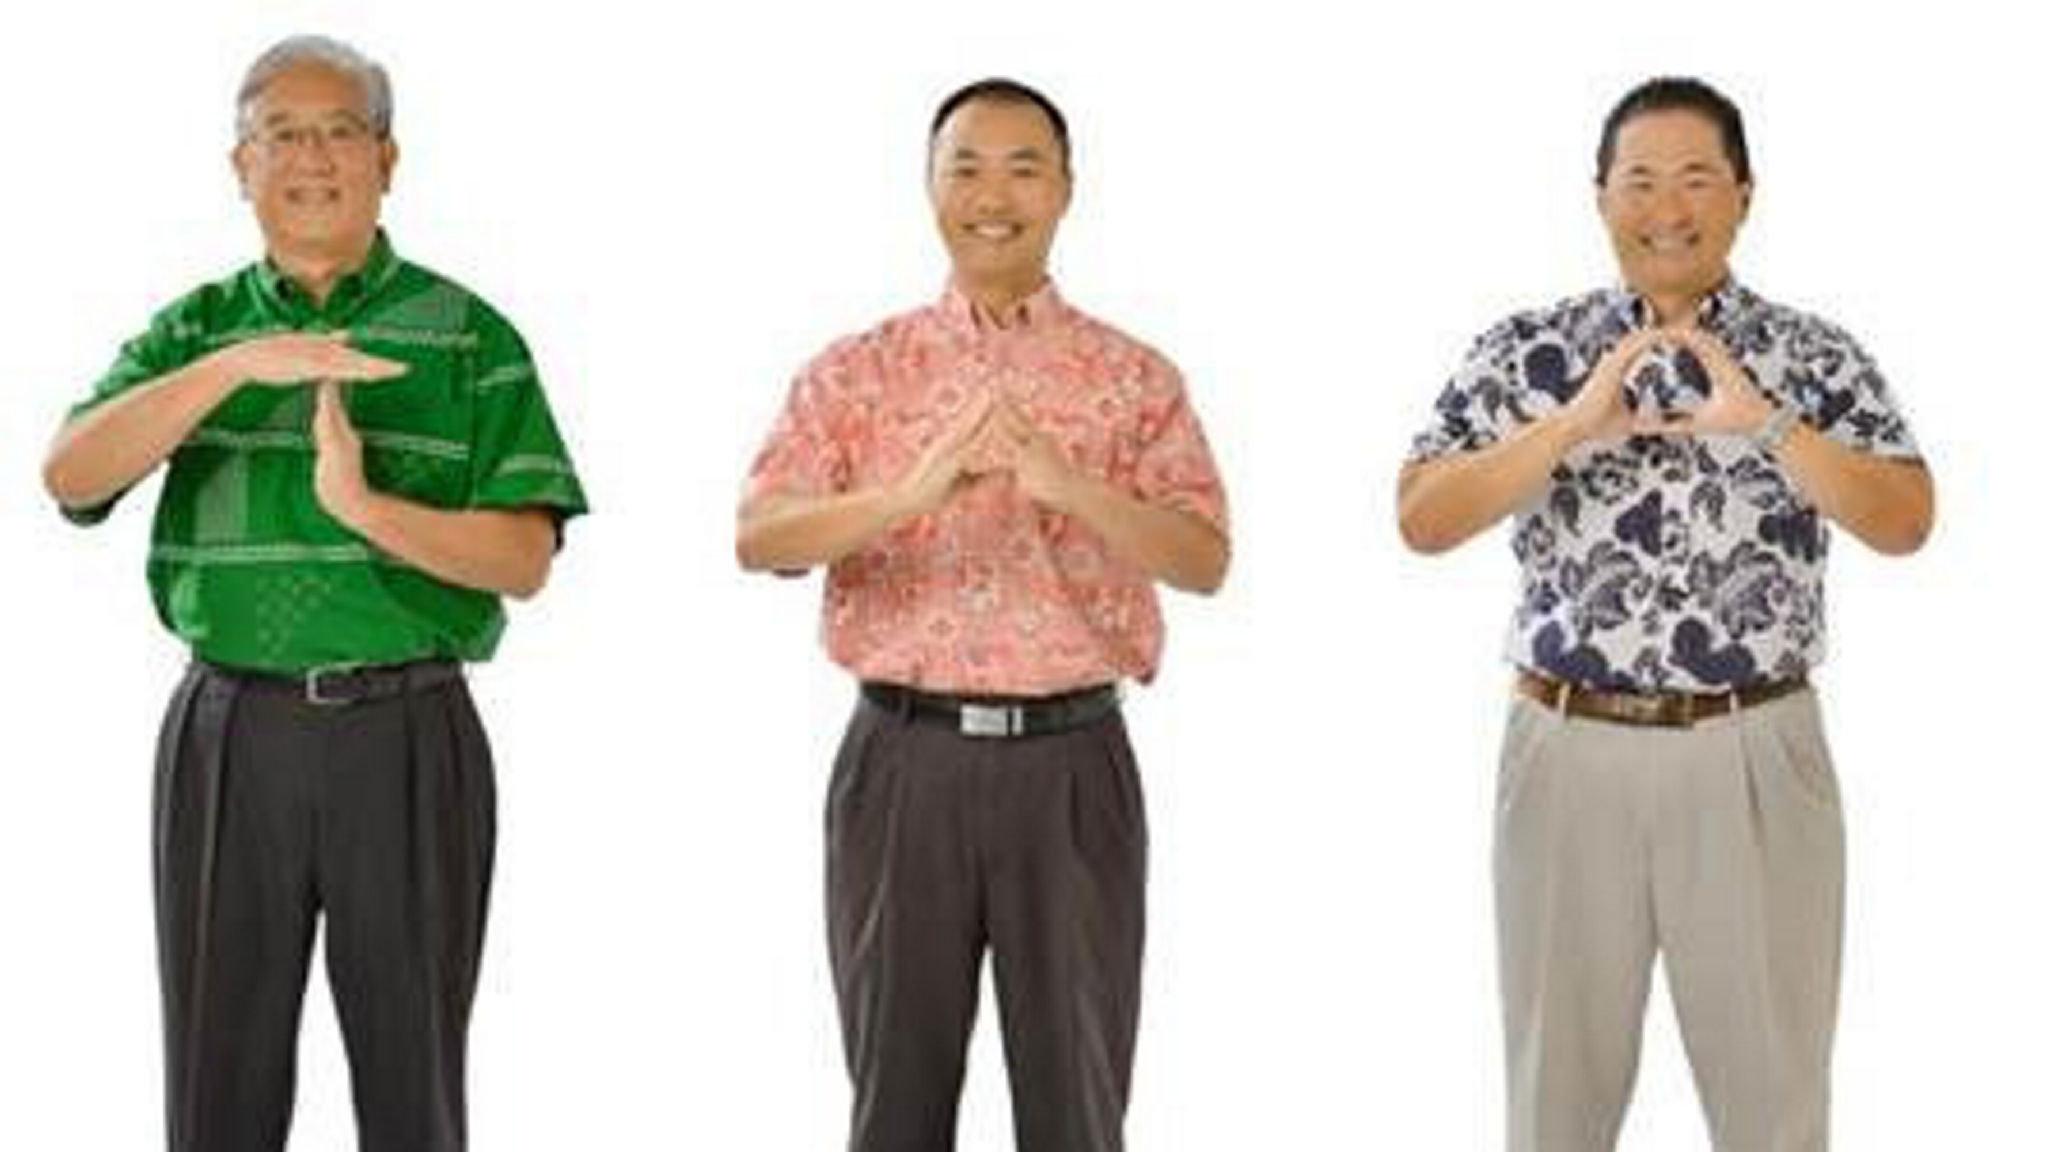 Local language helps Hawaiian retirement adviser to connect